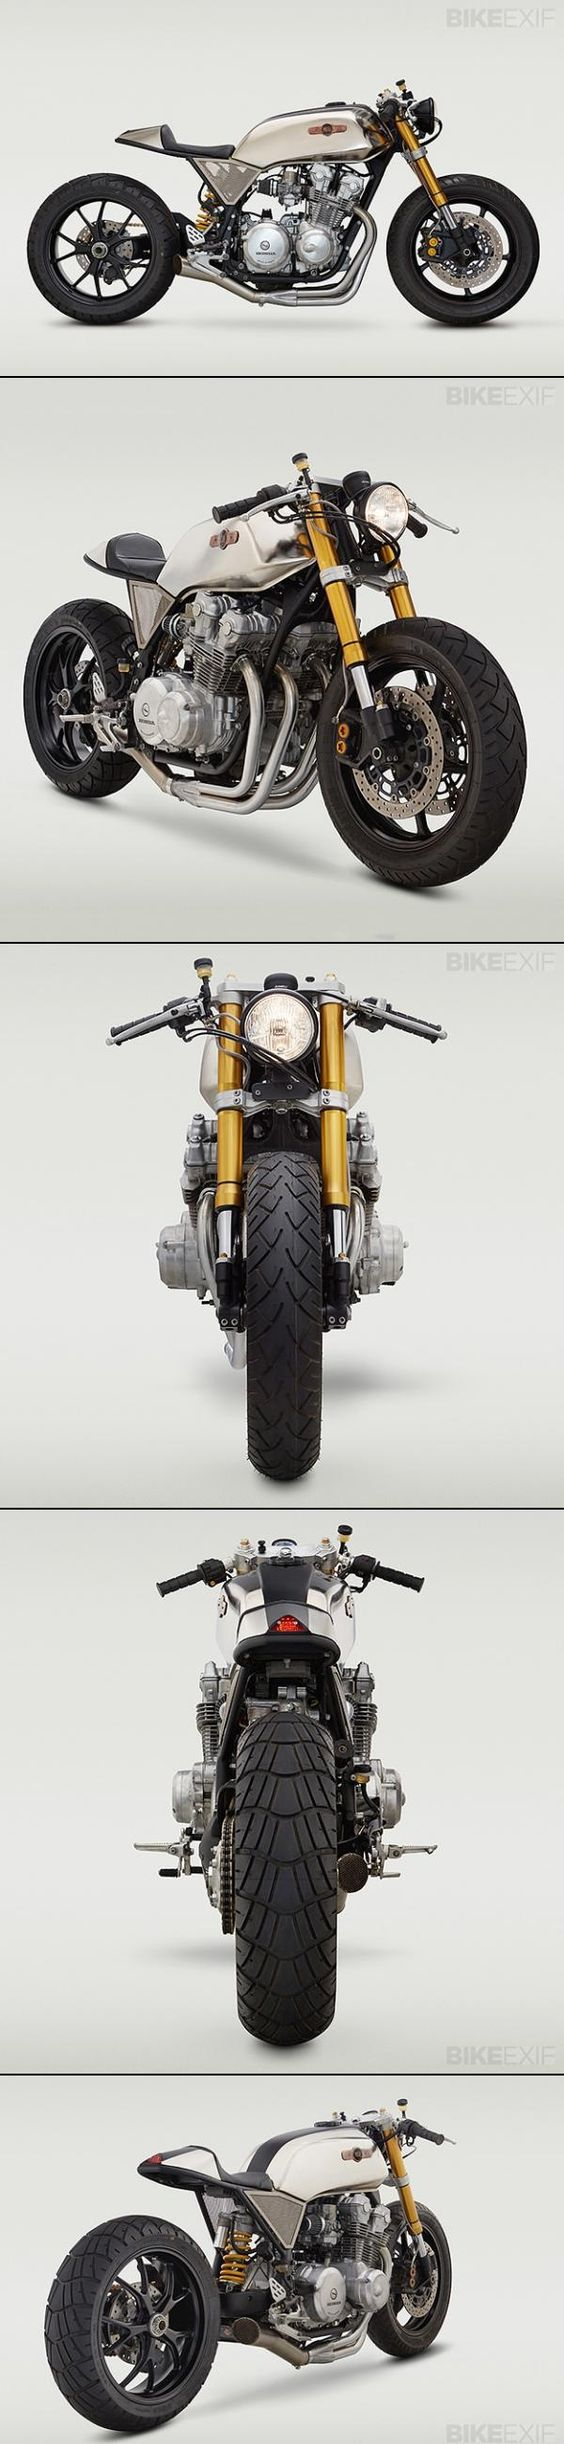 HONDA CB750 SUPERSTRADA Classified Moto